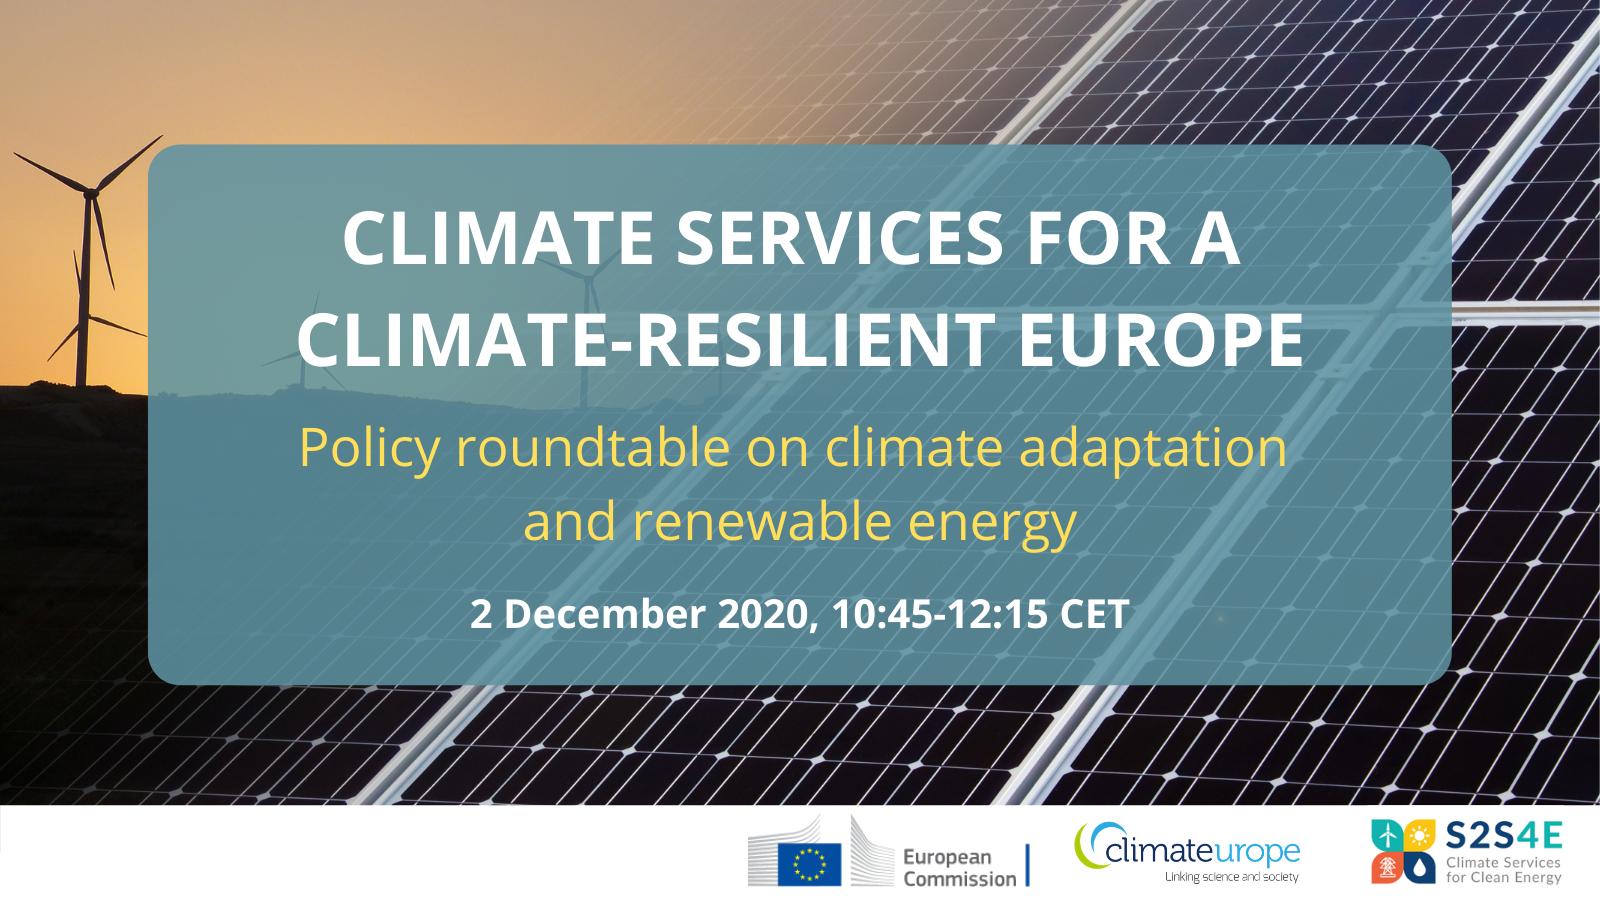 lneg-participou-no-evento-climate-services-for-a-climate-resilient-europe